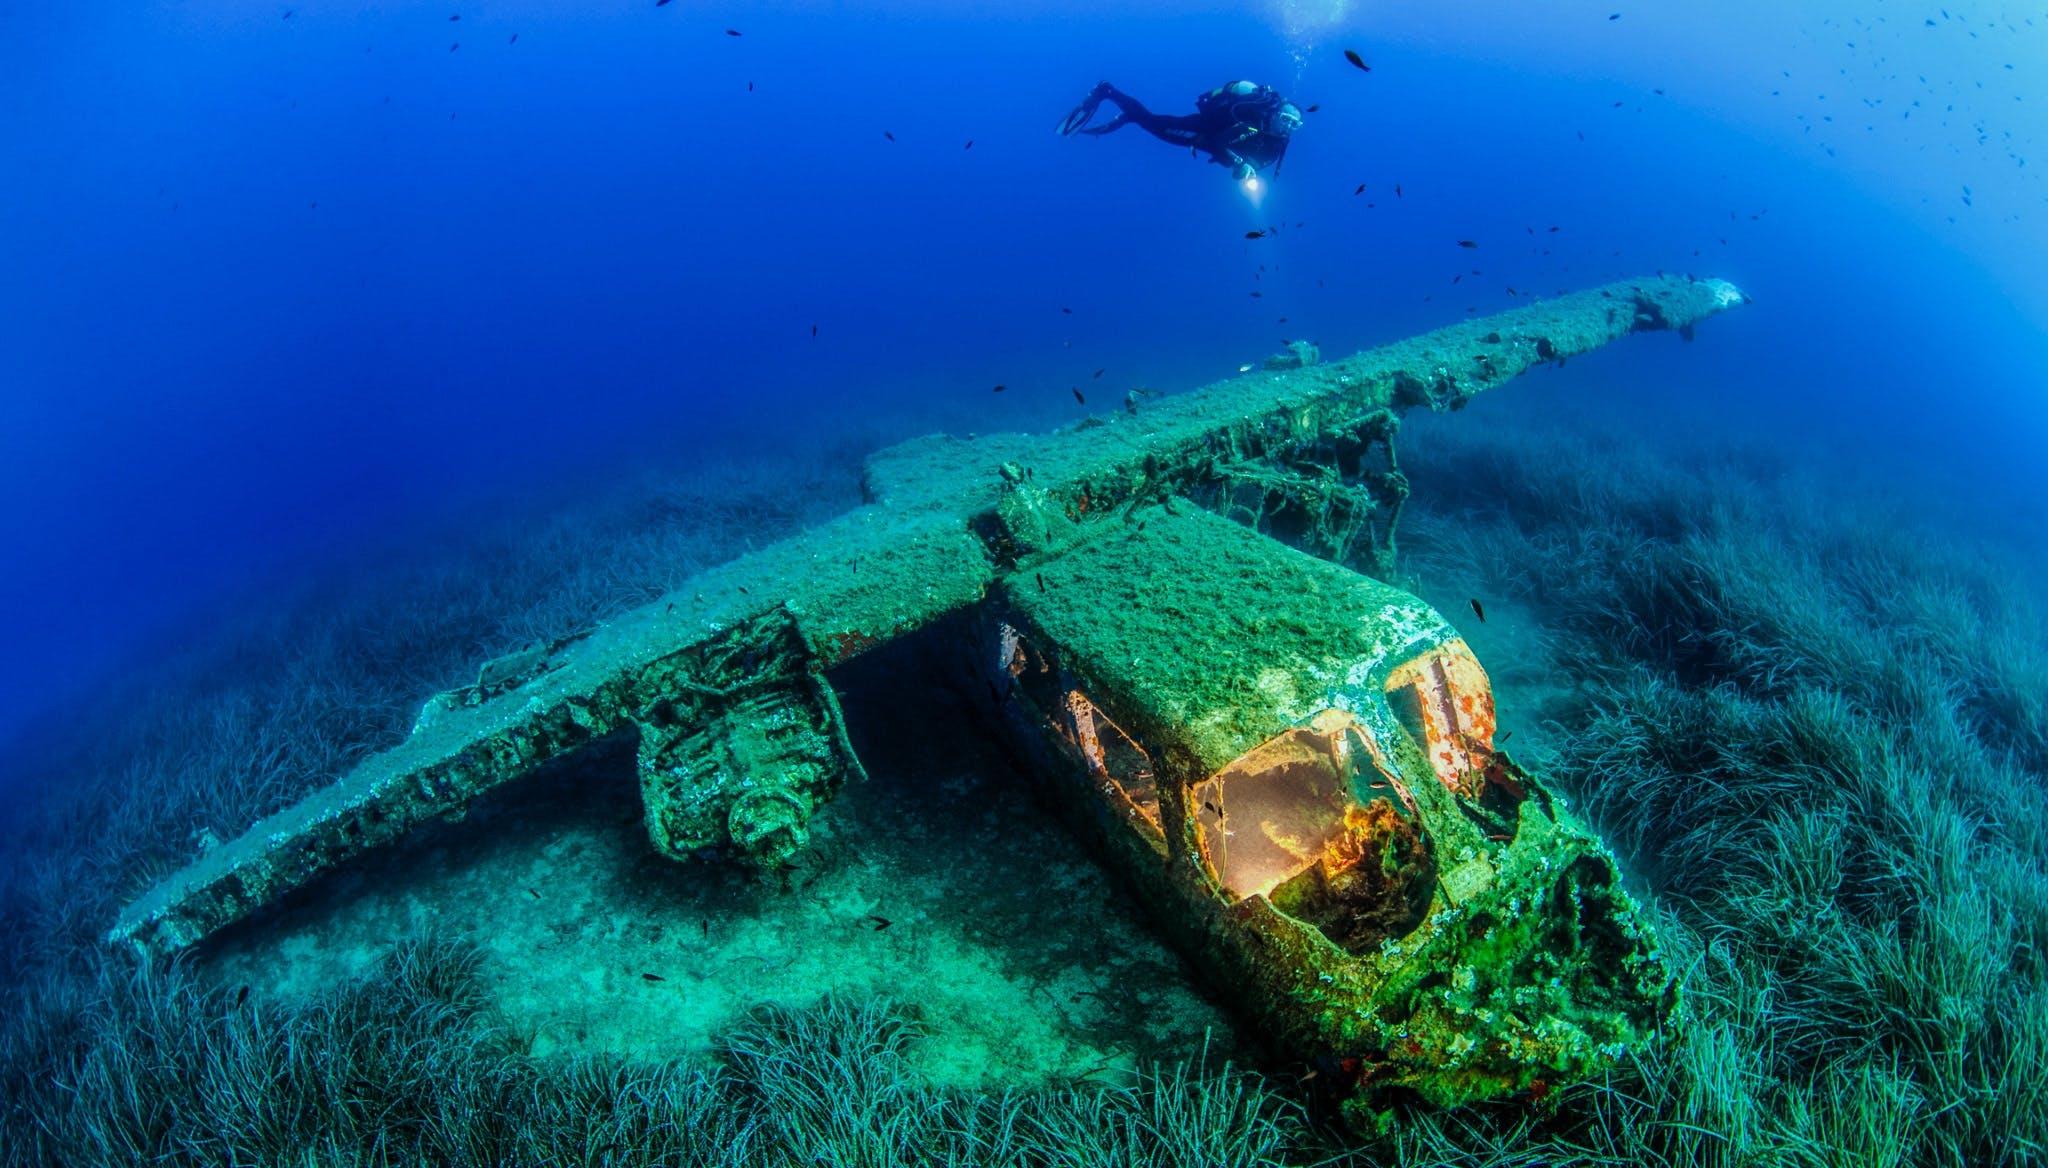 AE underwater